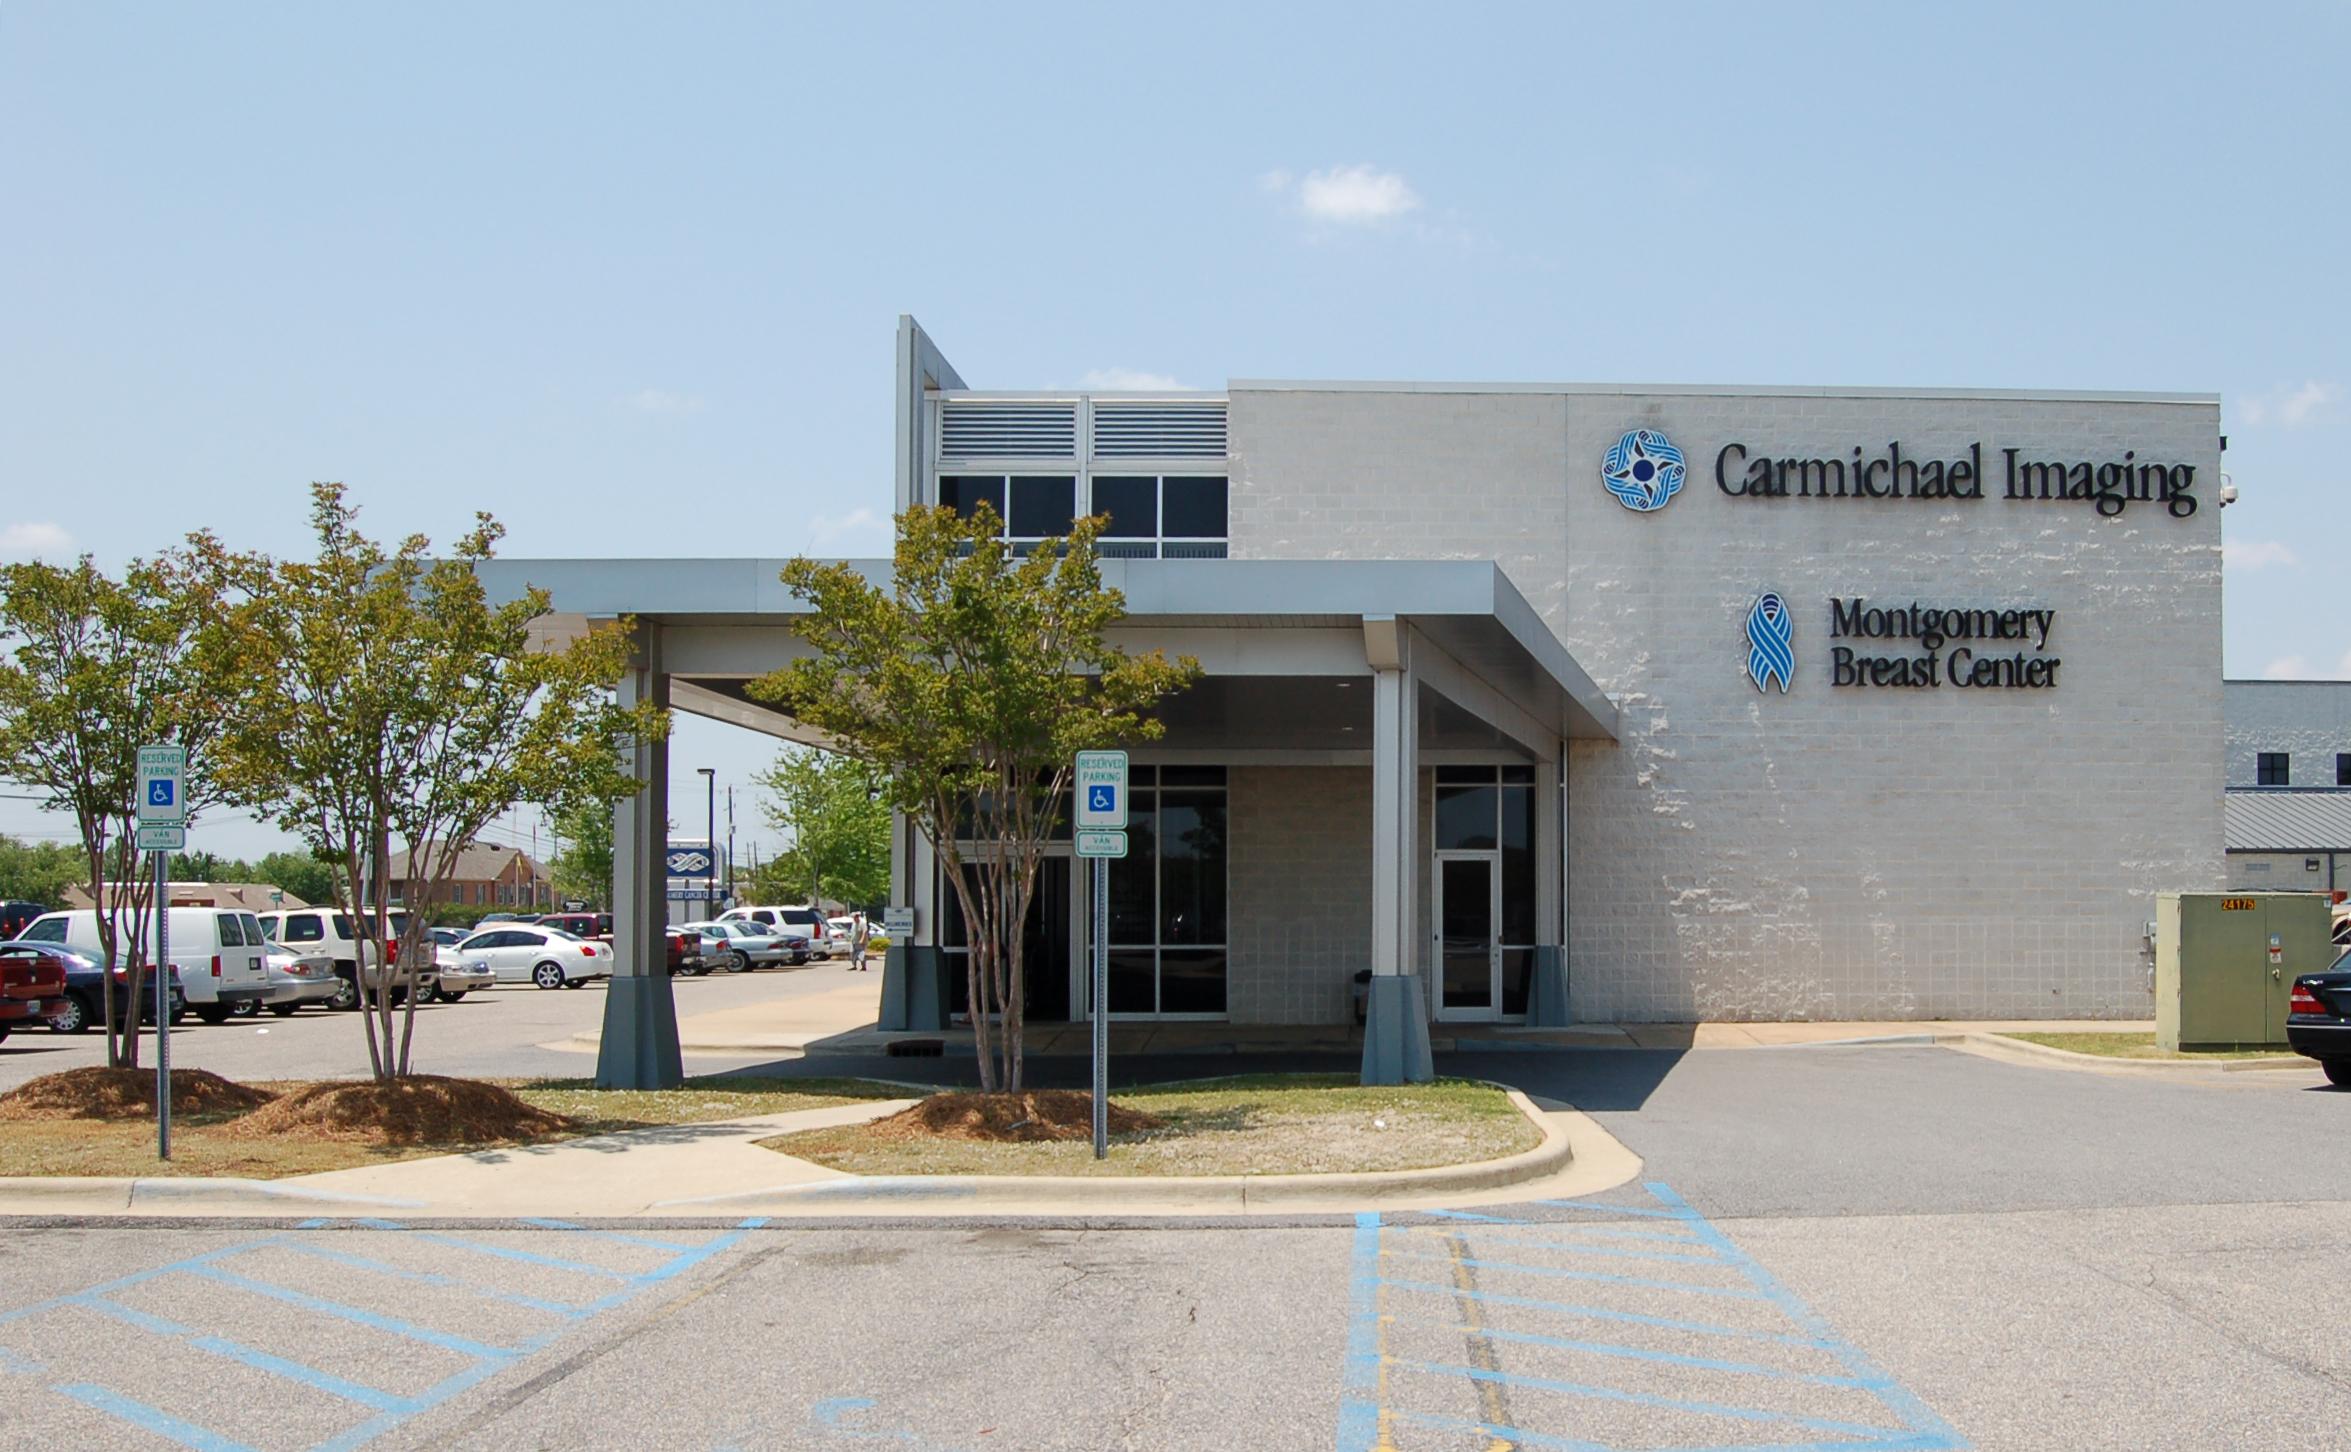 carmichael imaging 2.jpg